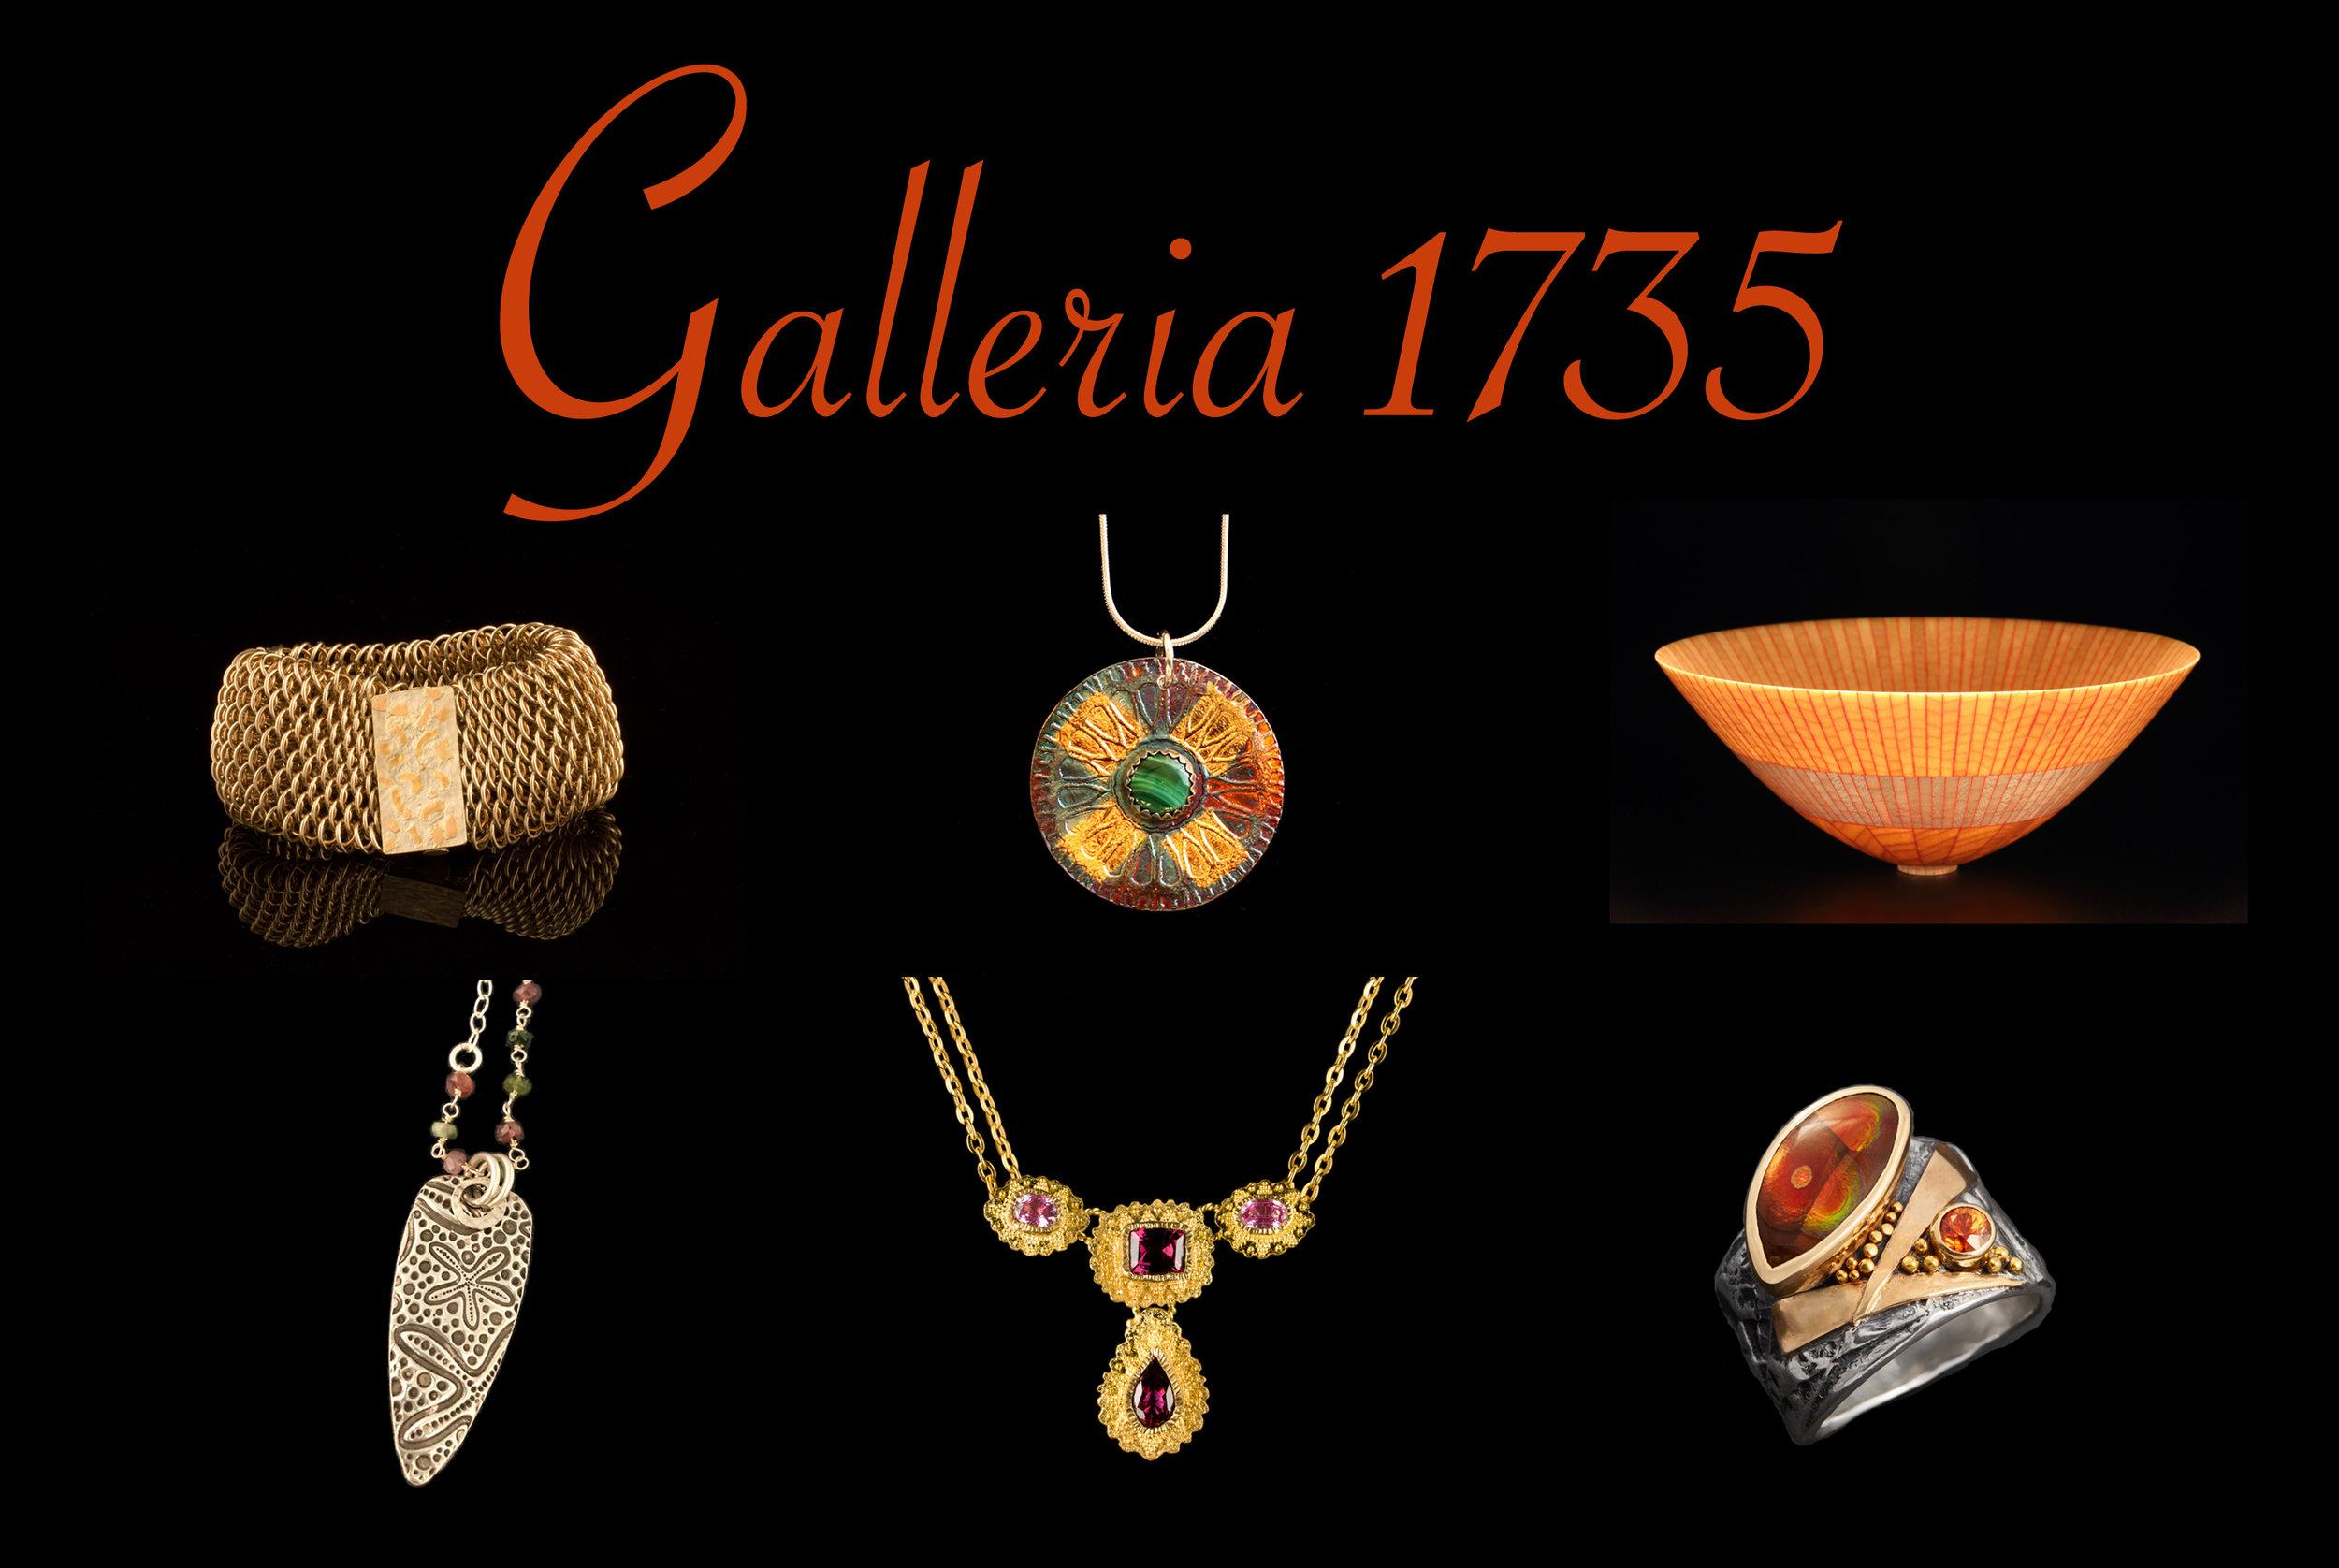 Galleria 1735 front.jpg